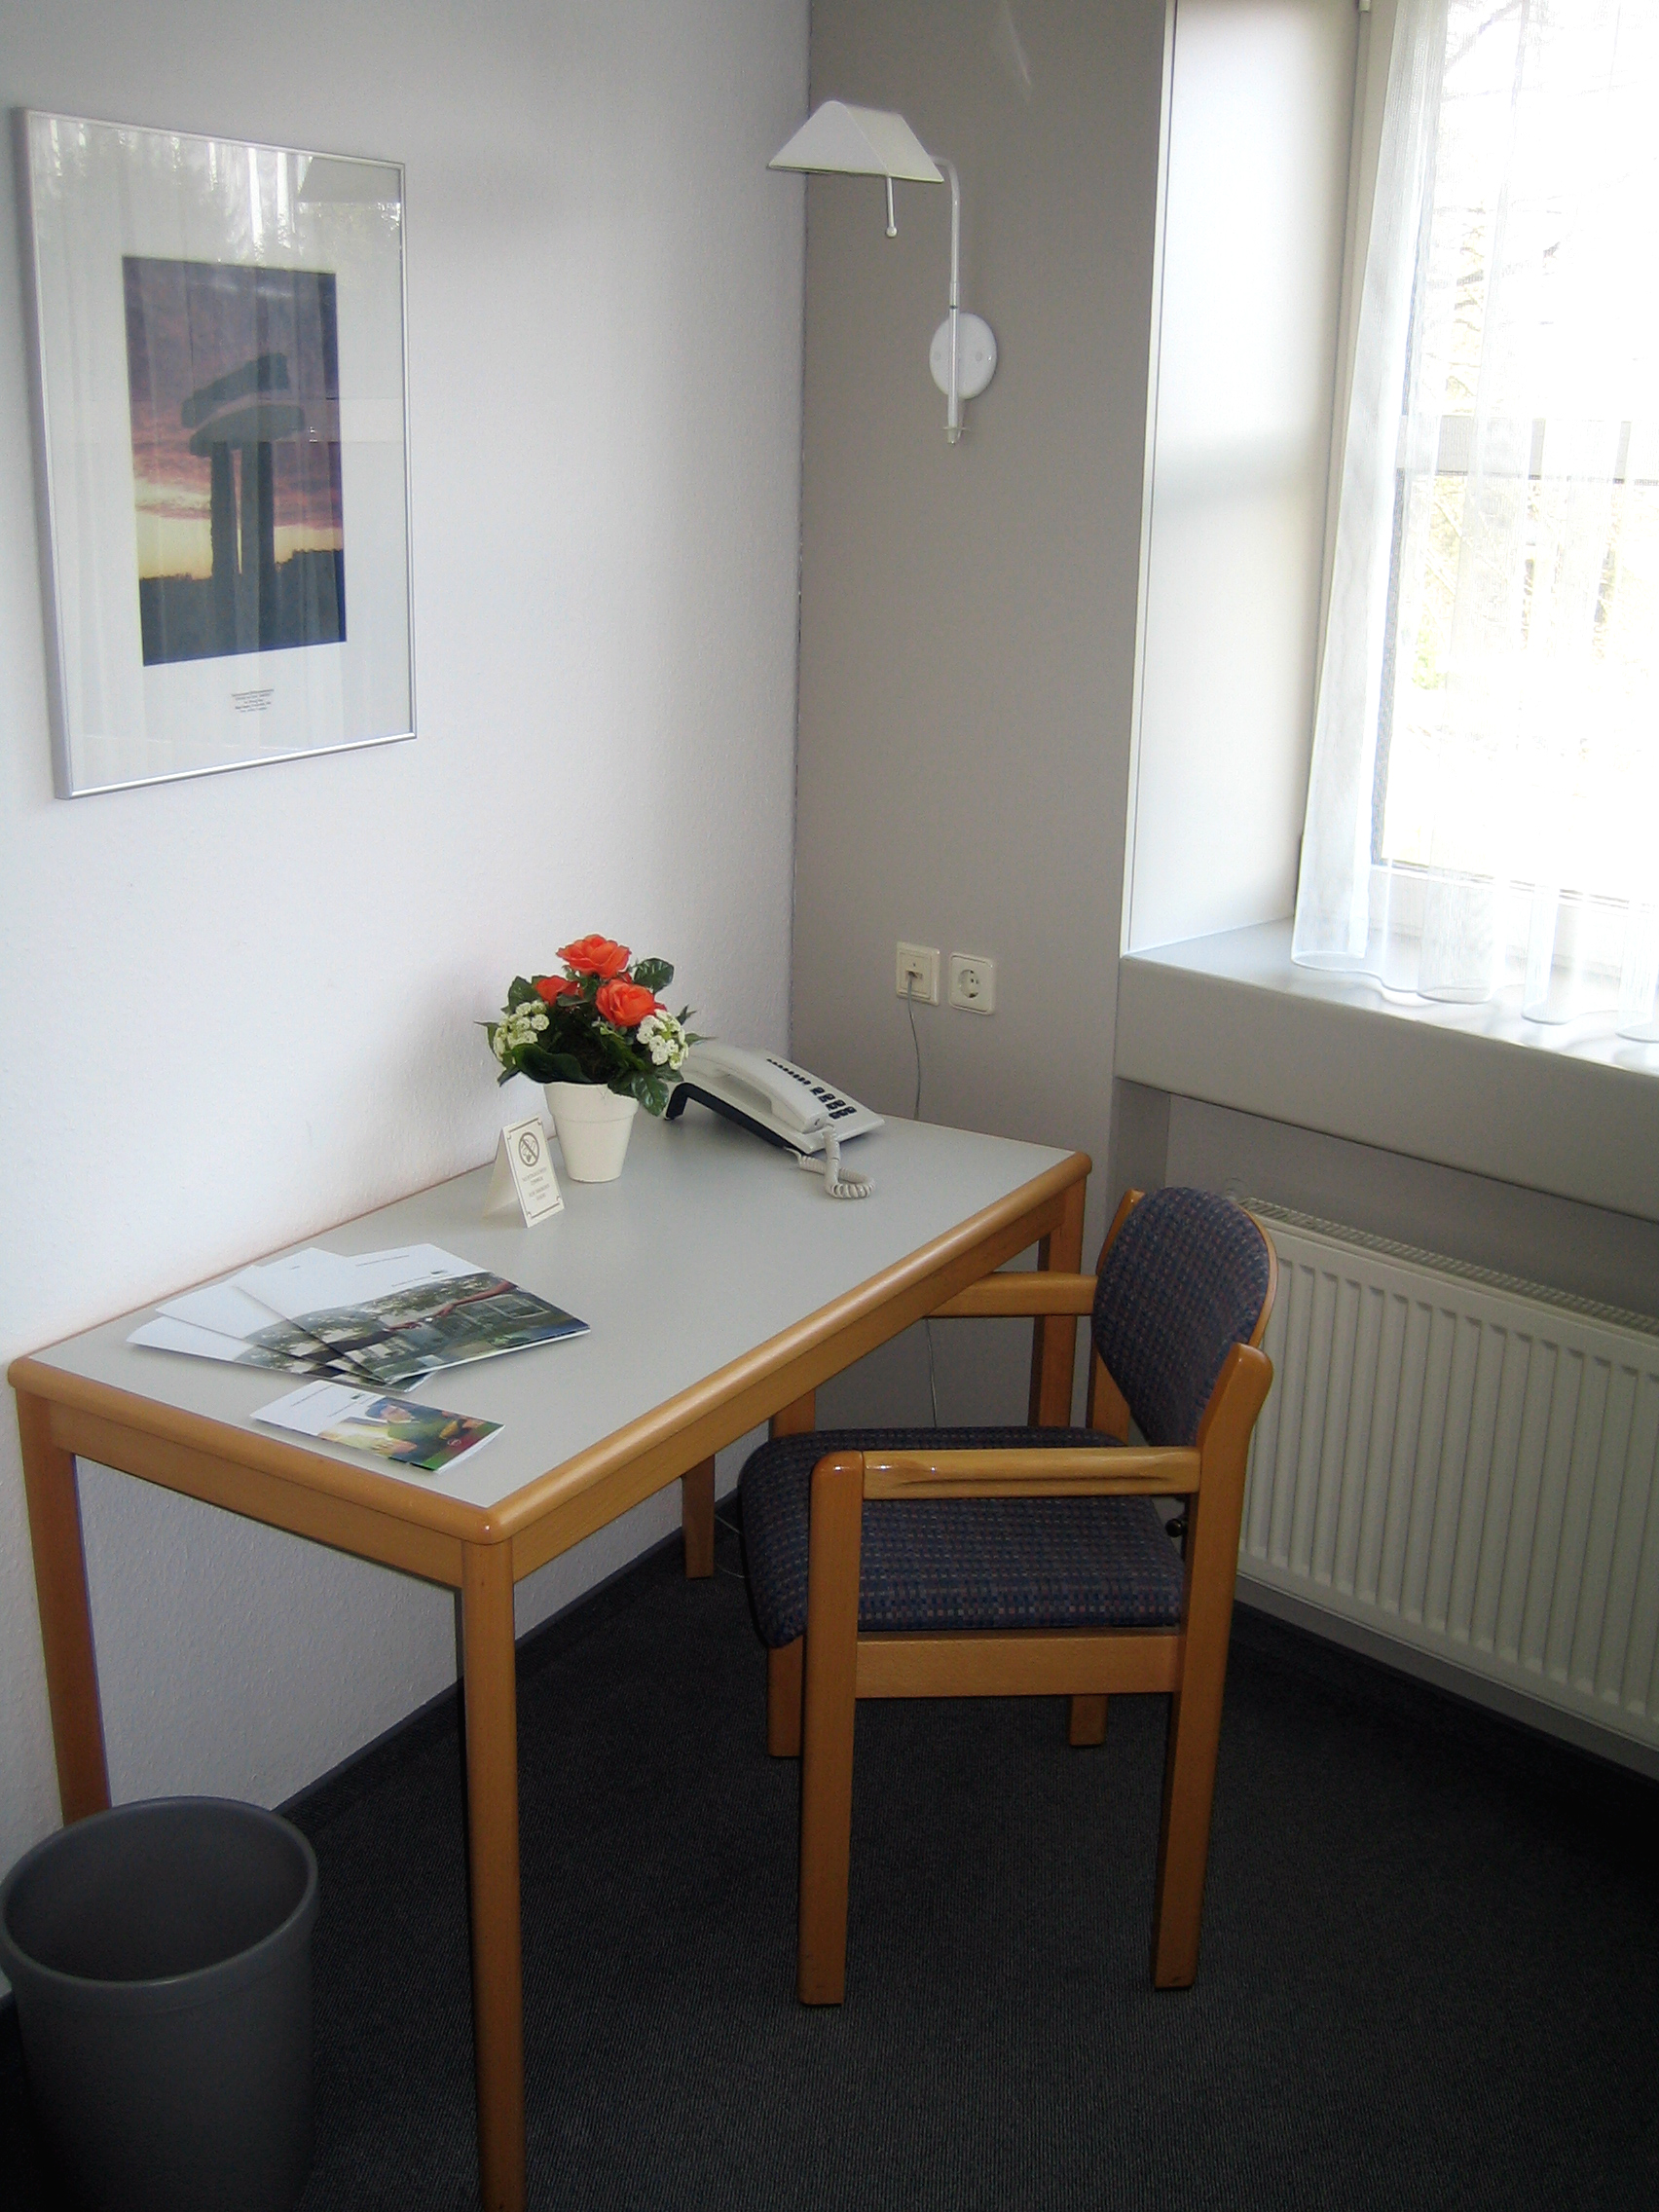 File Otzenhausen bureau chambre b¢timent principal Wikimedia